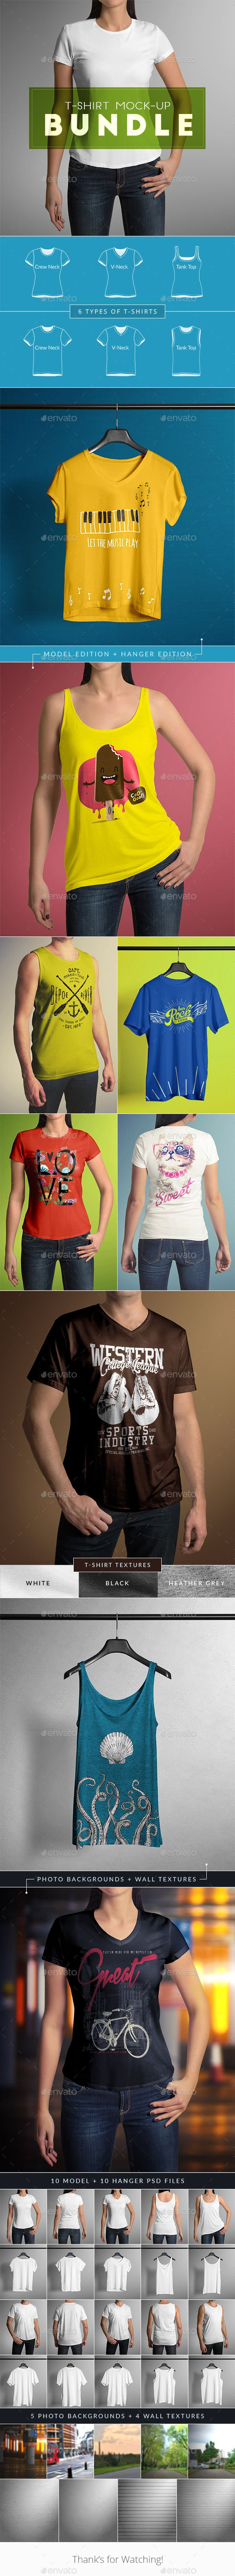 T shirt design jonesboro ar - T Shirt Mock Up Bundle